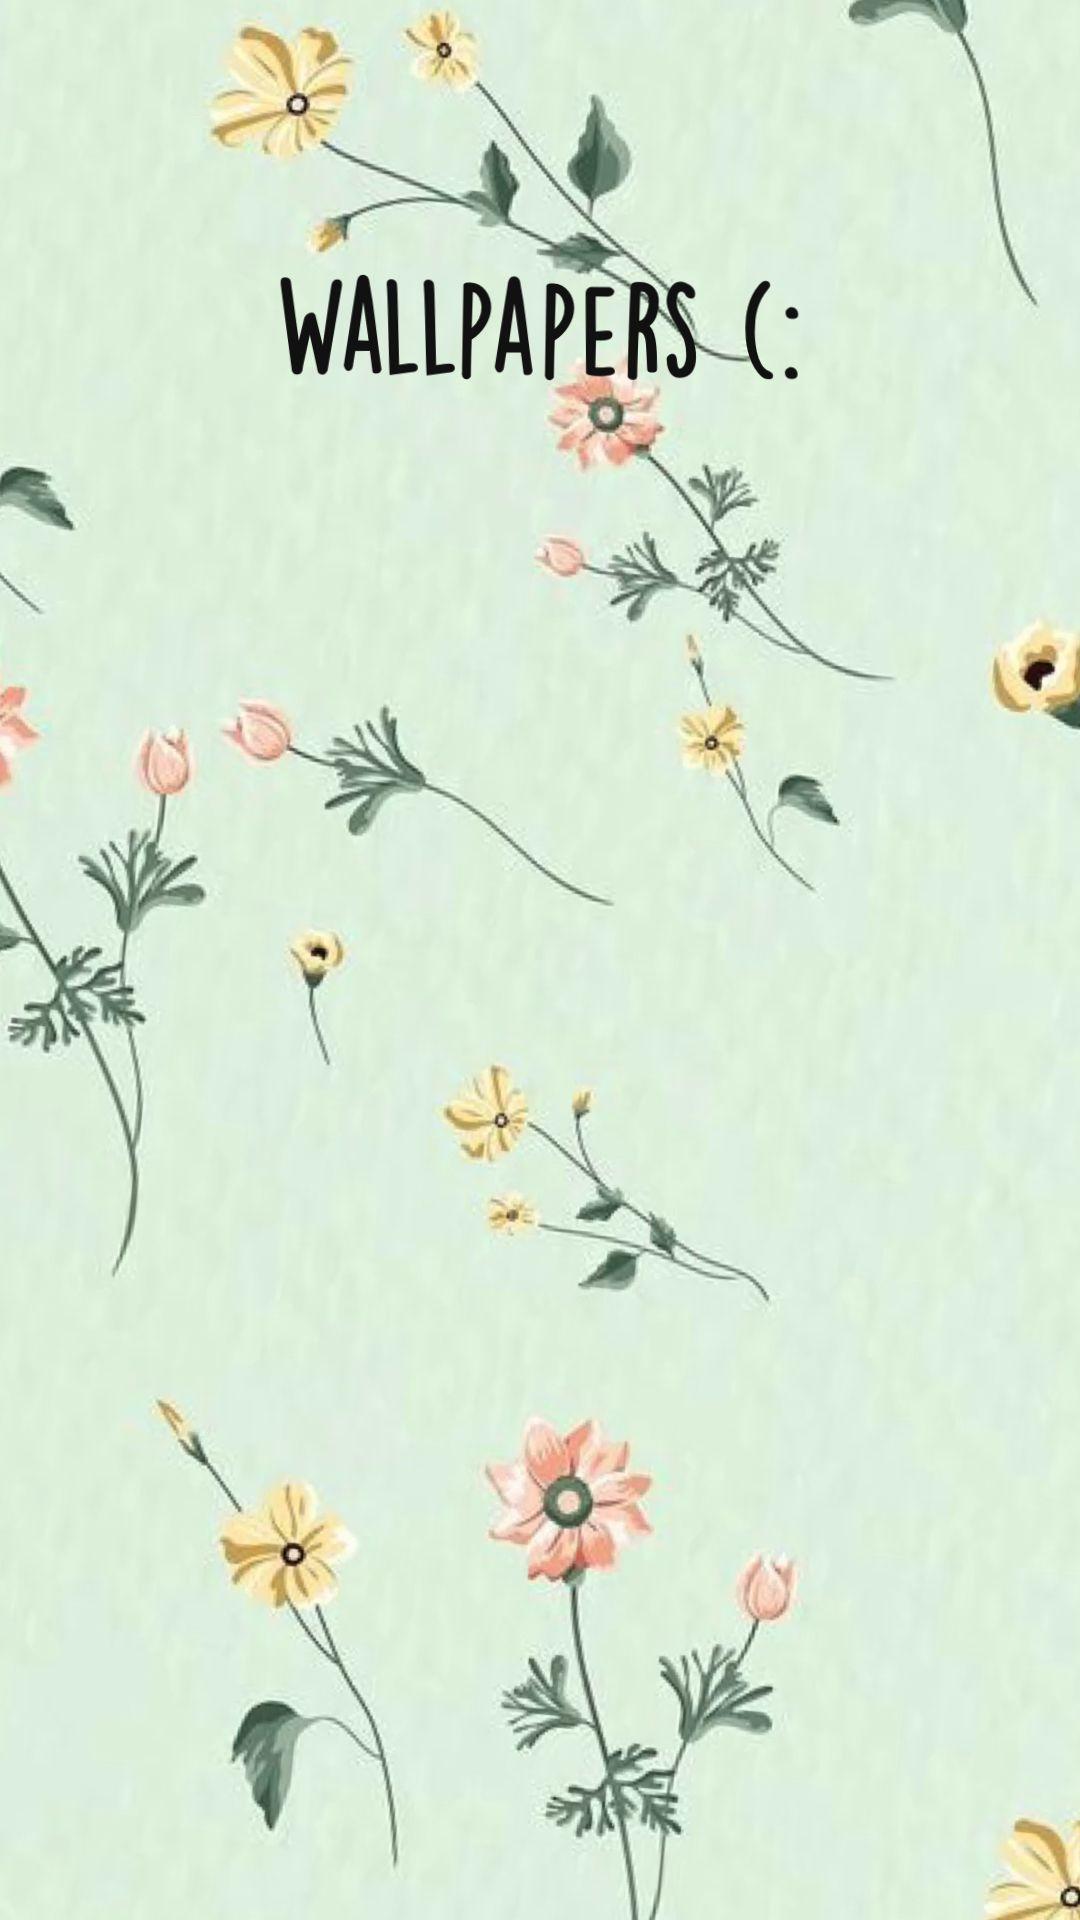 Wallpapers (: